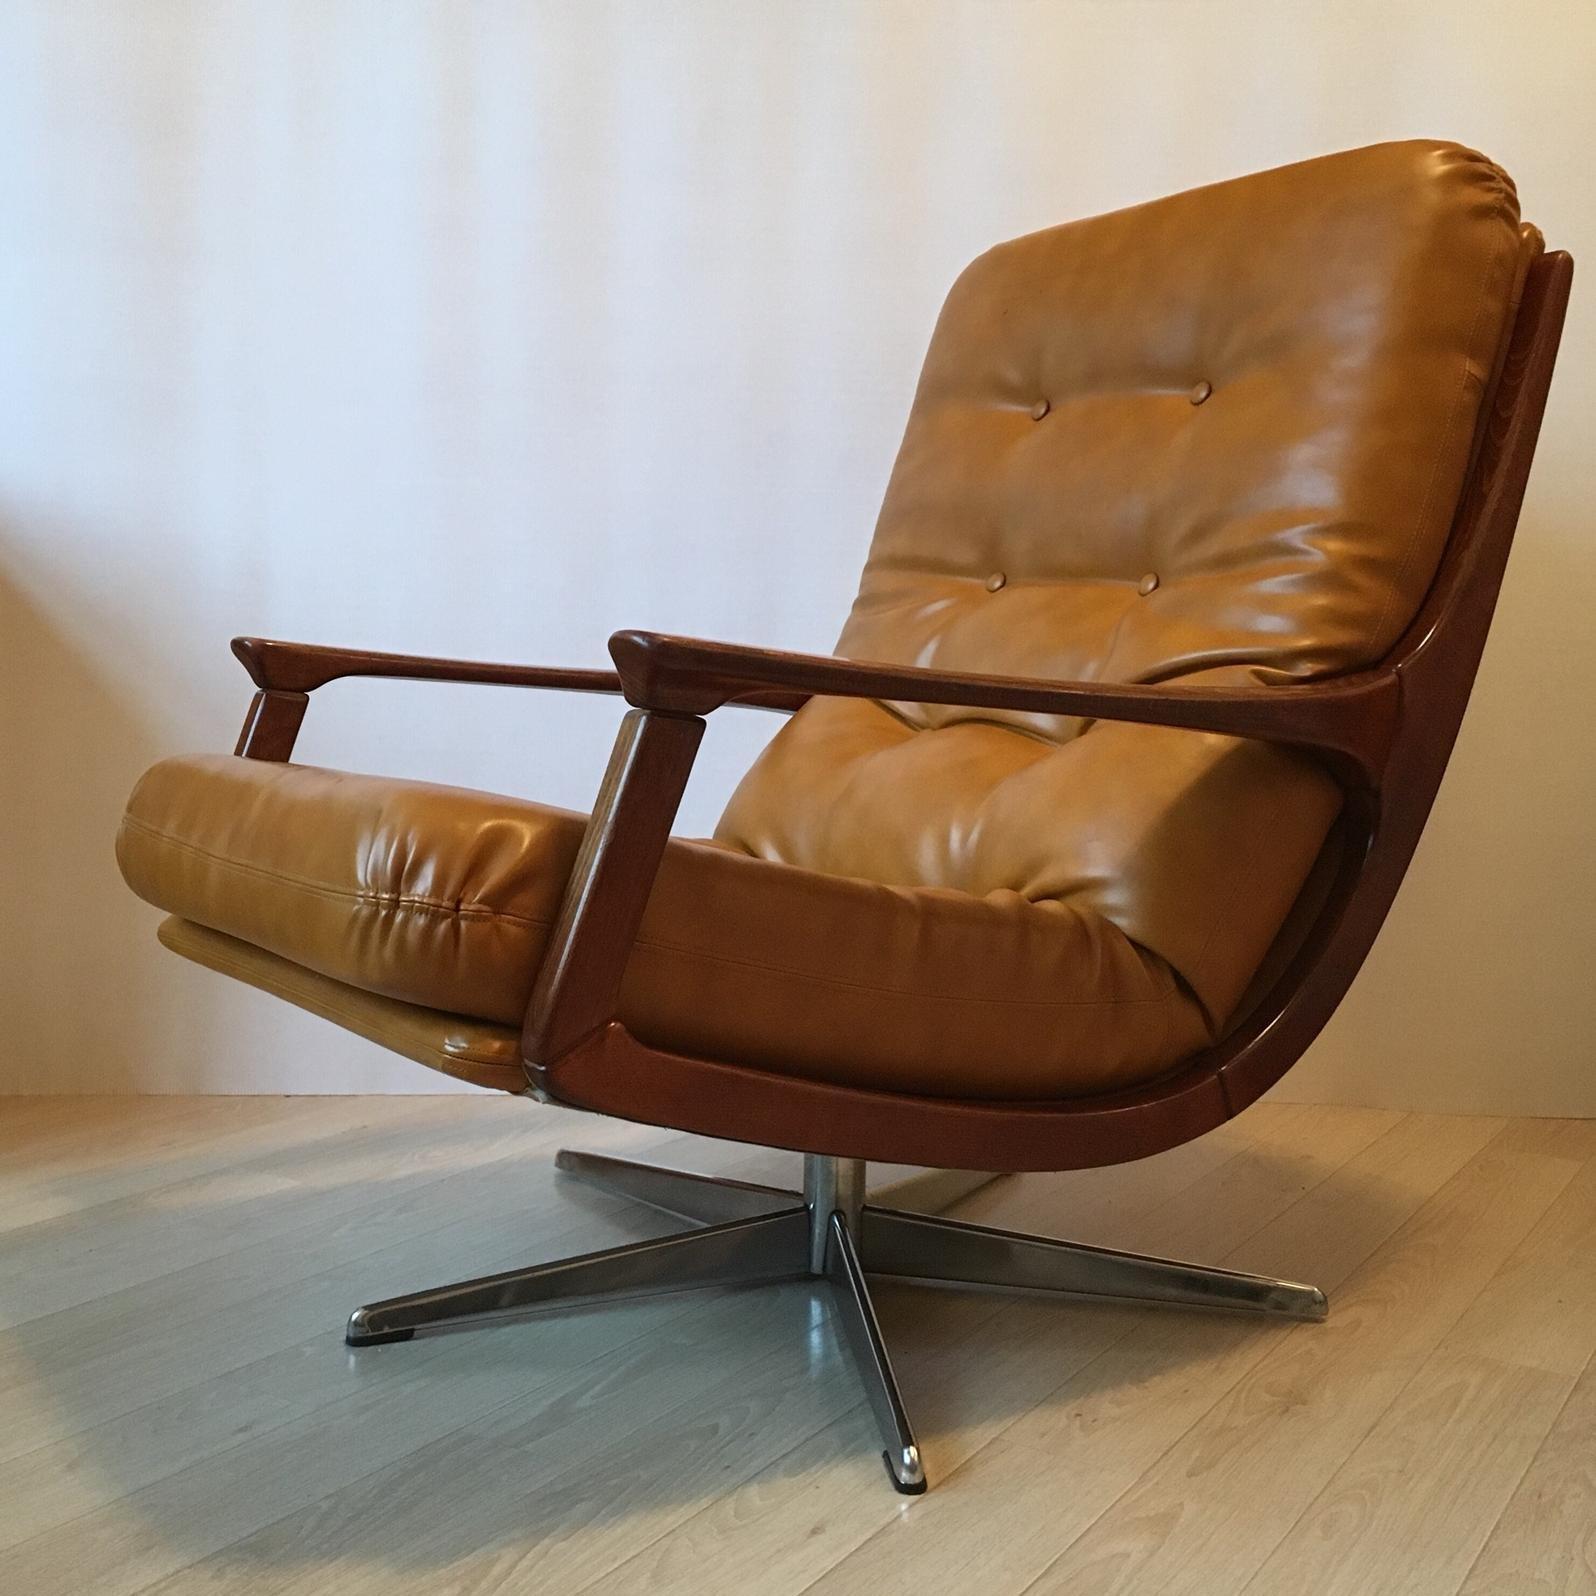 modern leather swivel lounge chair cane bottom rocking midcentury german camel